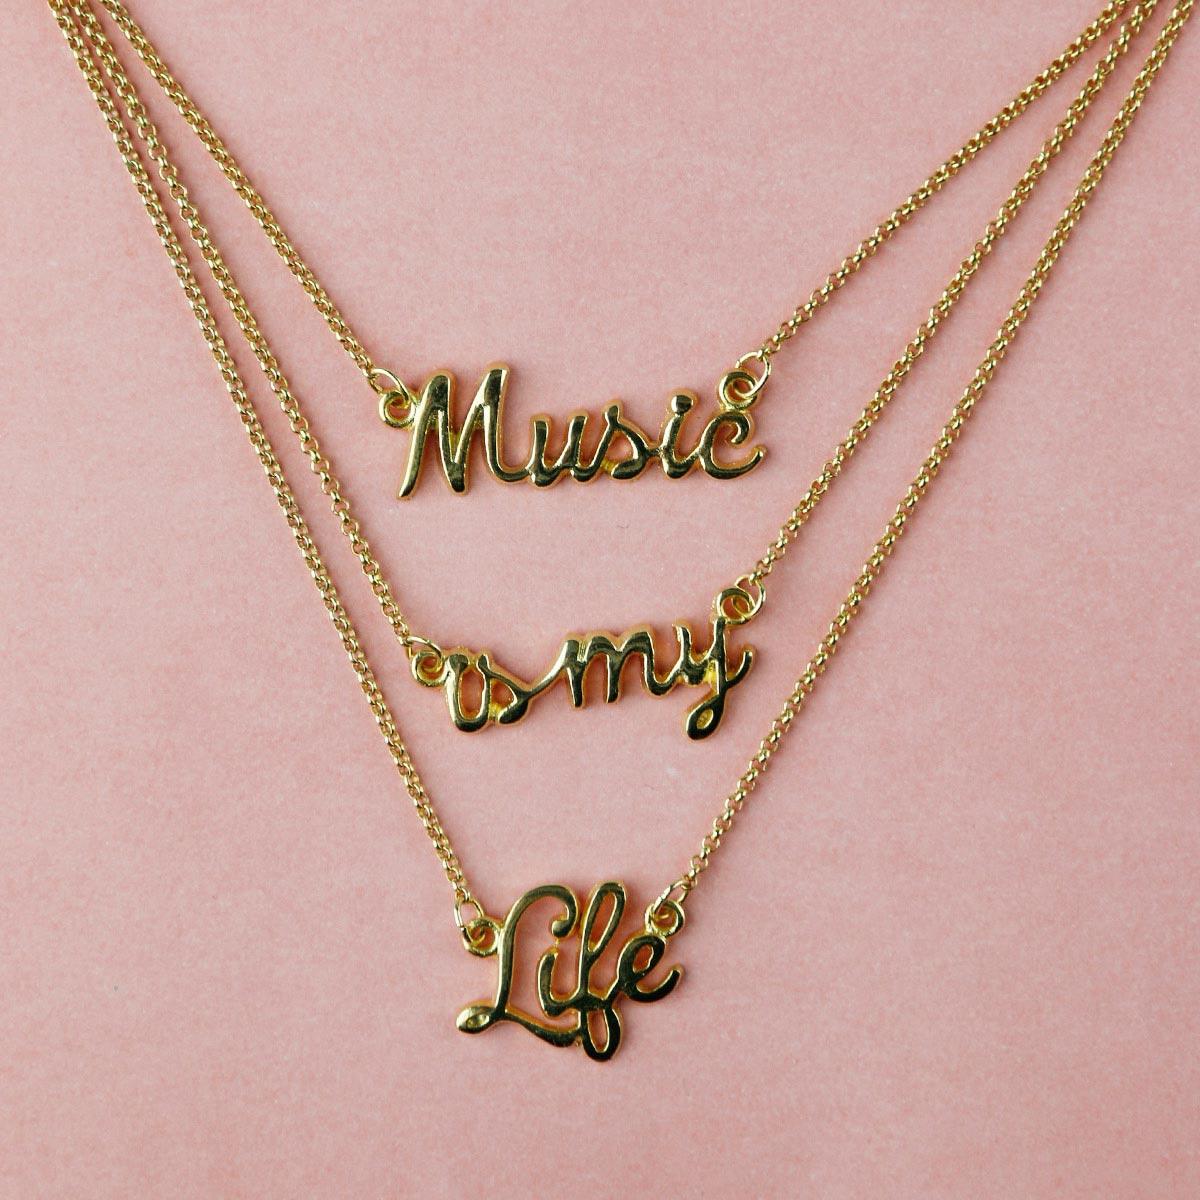 Colar Ouro Luan Santana Music Is My Life